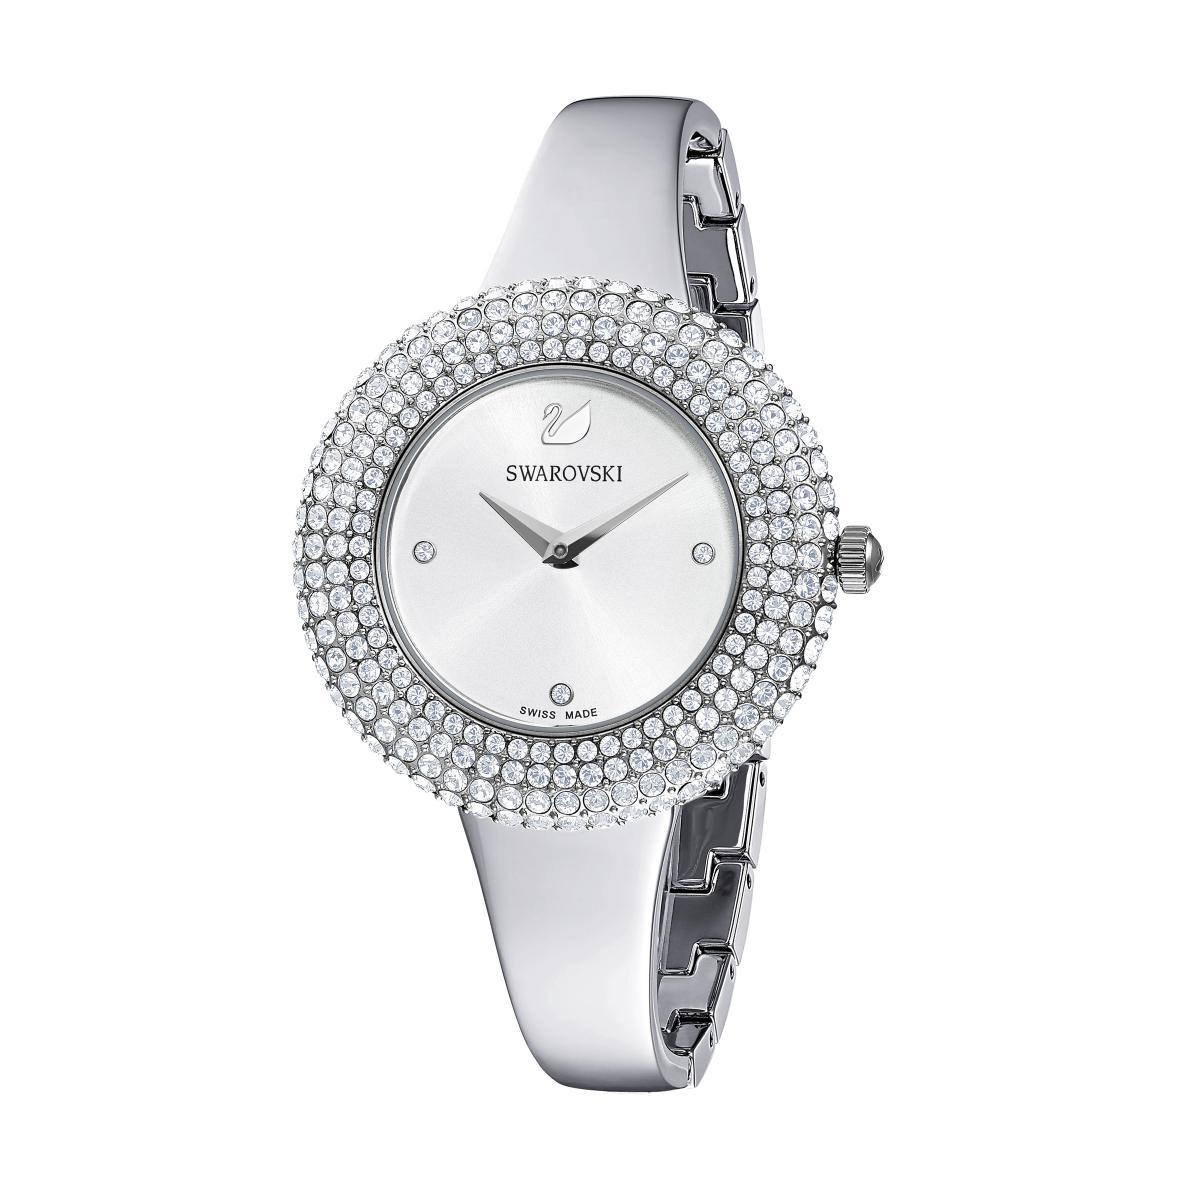 Montre Swarovski 5483853 - Crystal Rose Bracelet Jonc Acier é Lunette Sertie En Micro-Pavé - Swarovski montres - Modalova